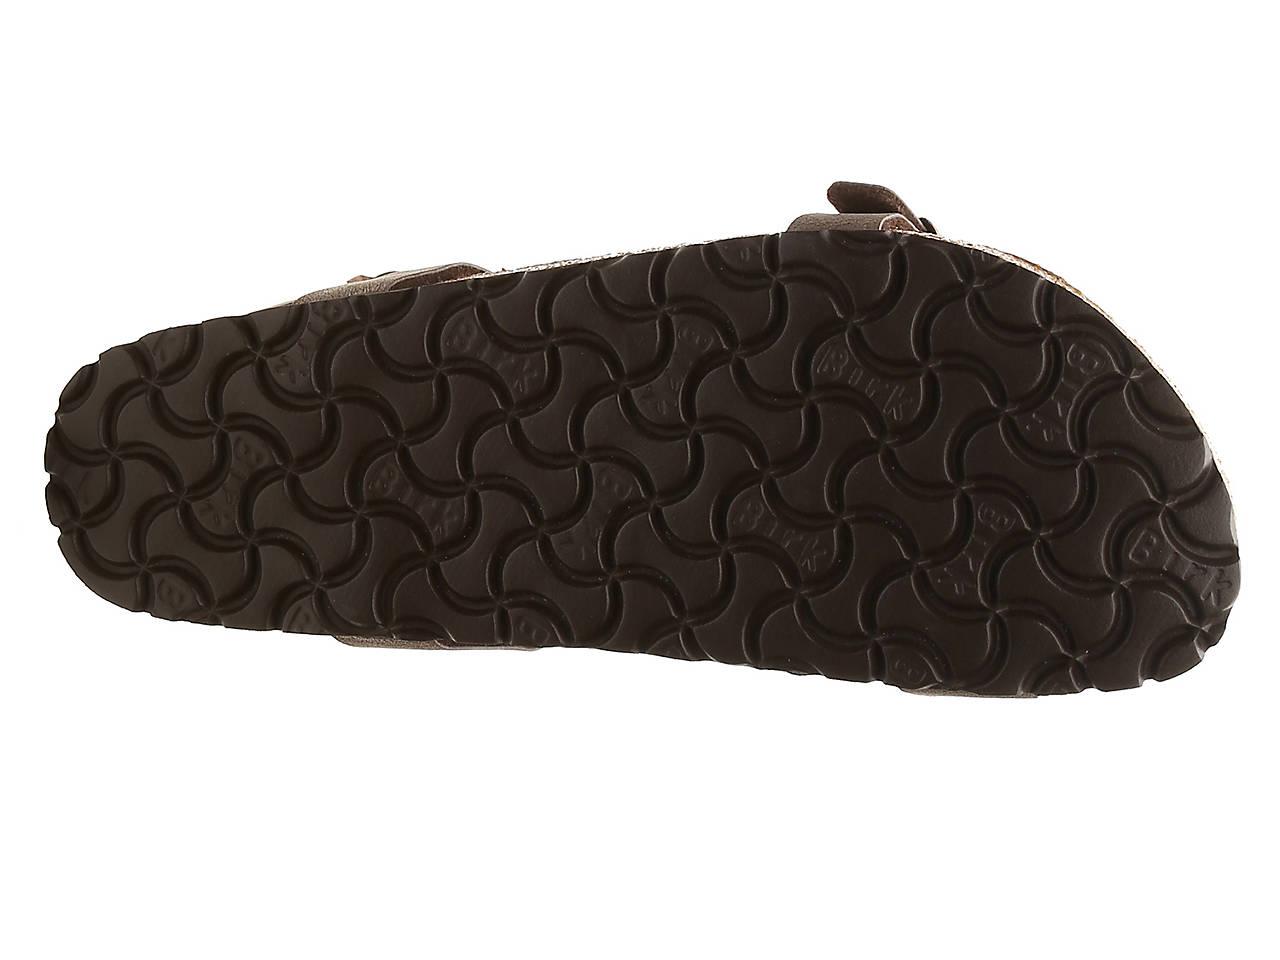 8be0cbb46107 Birkenstock Daloa Flat Sandal - Women s Women s Shoes